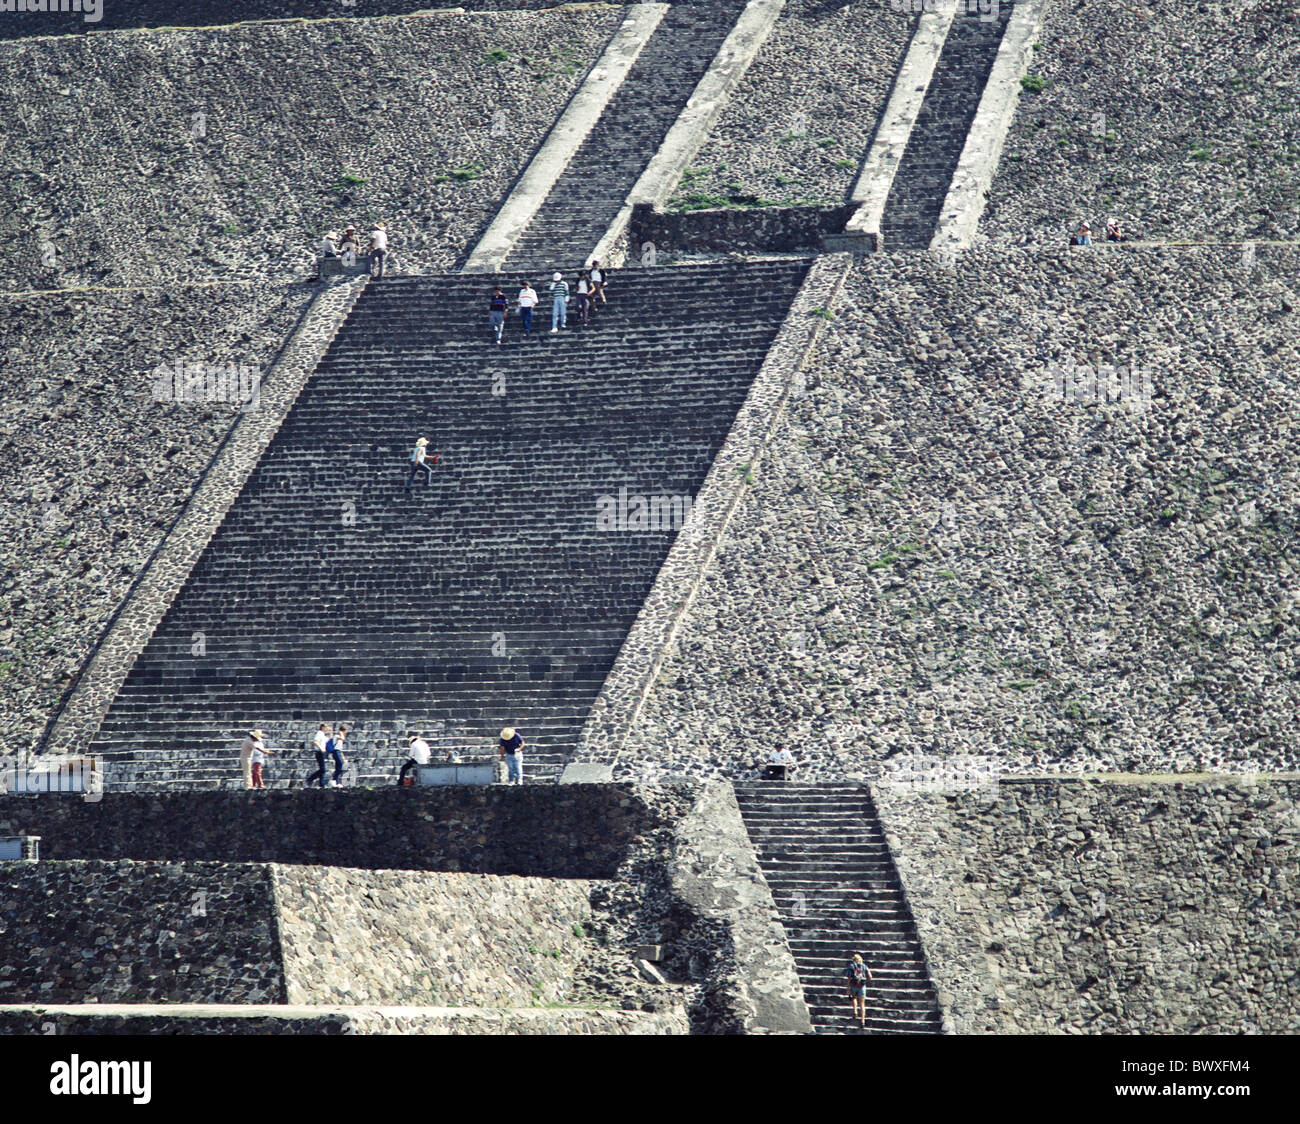 Azteken Ruinen Kultur Mexiko Mittelamerika Lateinamerika Personen Sonnen Pyramide Teotihuacan Treppe Stockbild